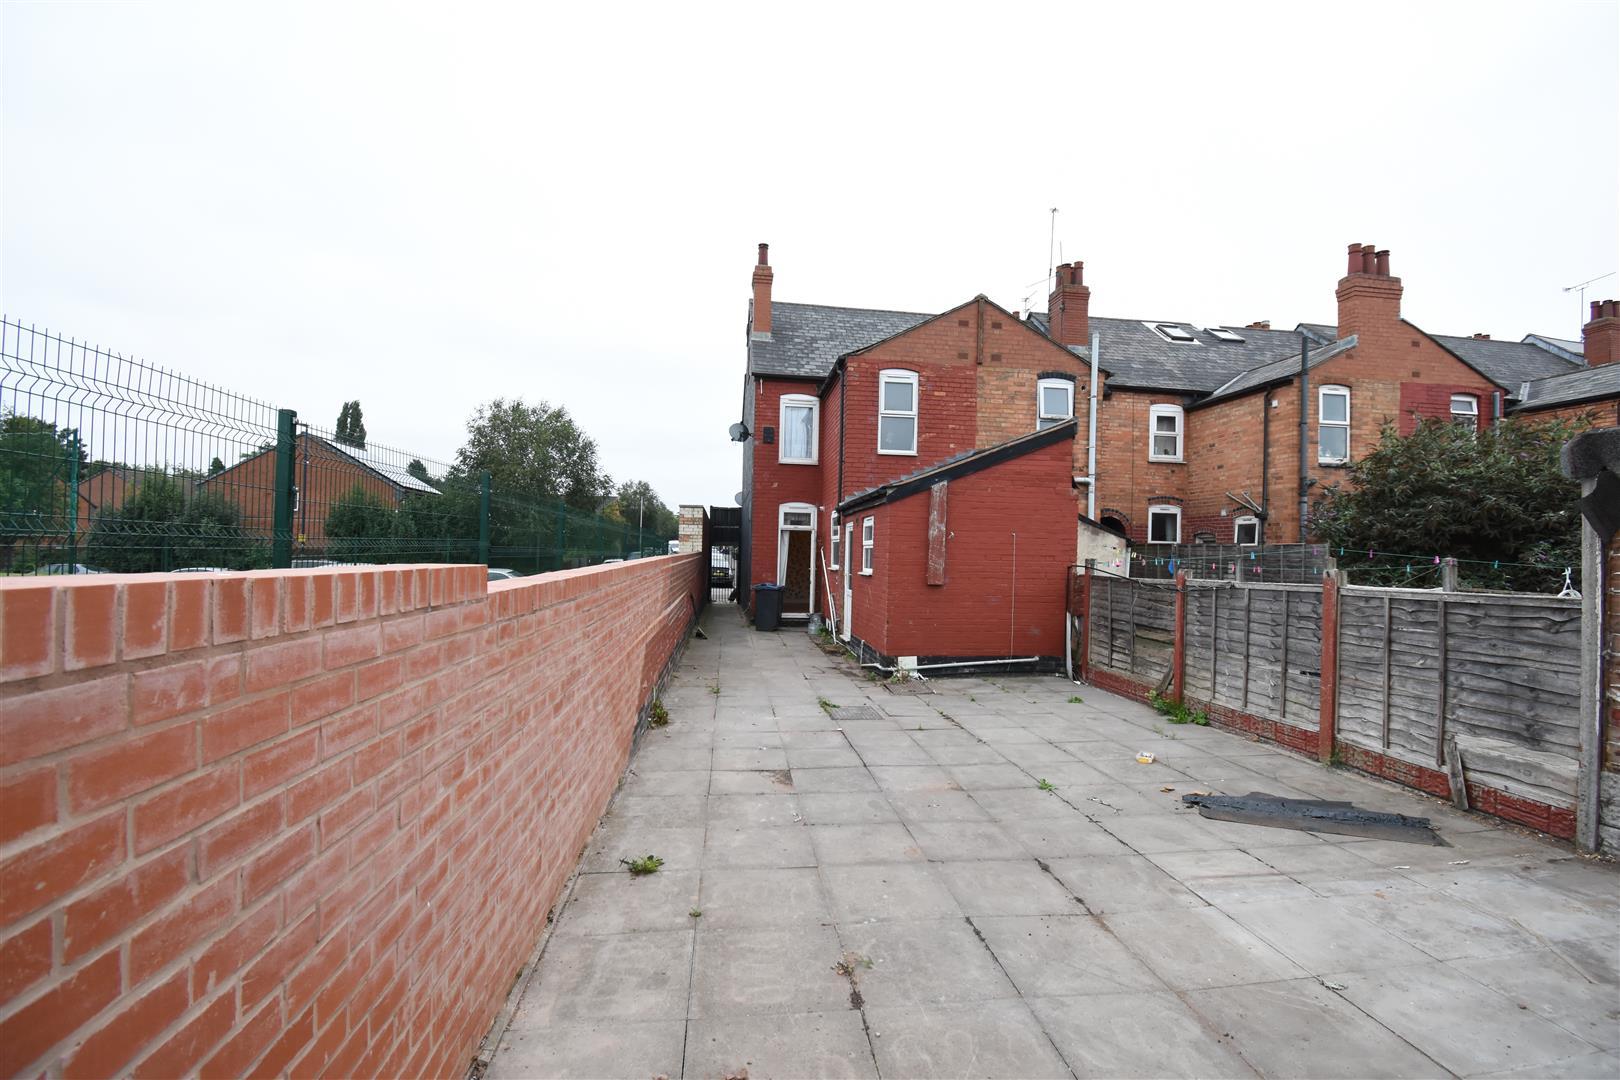 3 bed  for sale in Alderson Road, Alum Rock, Birmingham 11